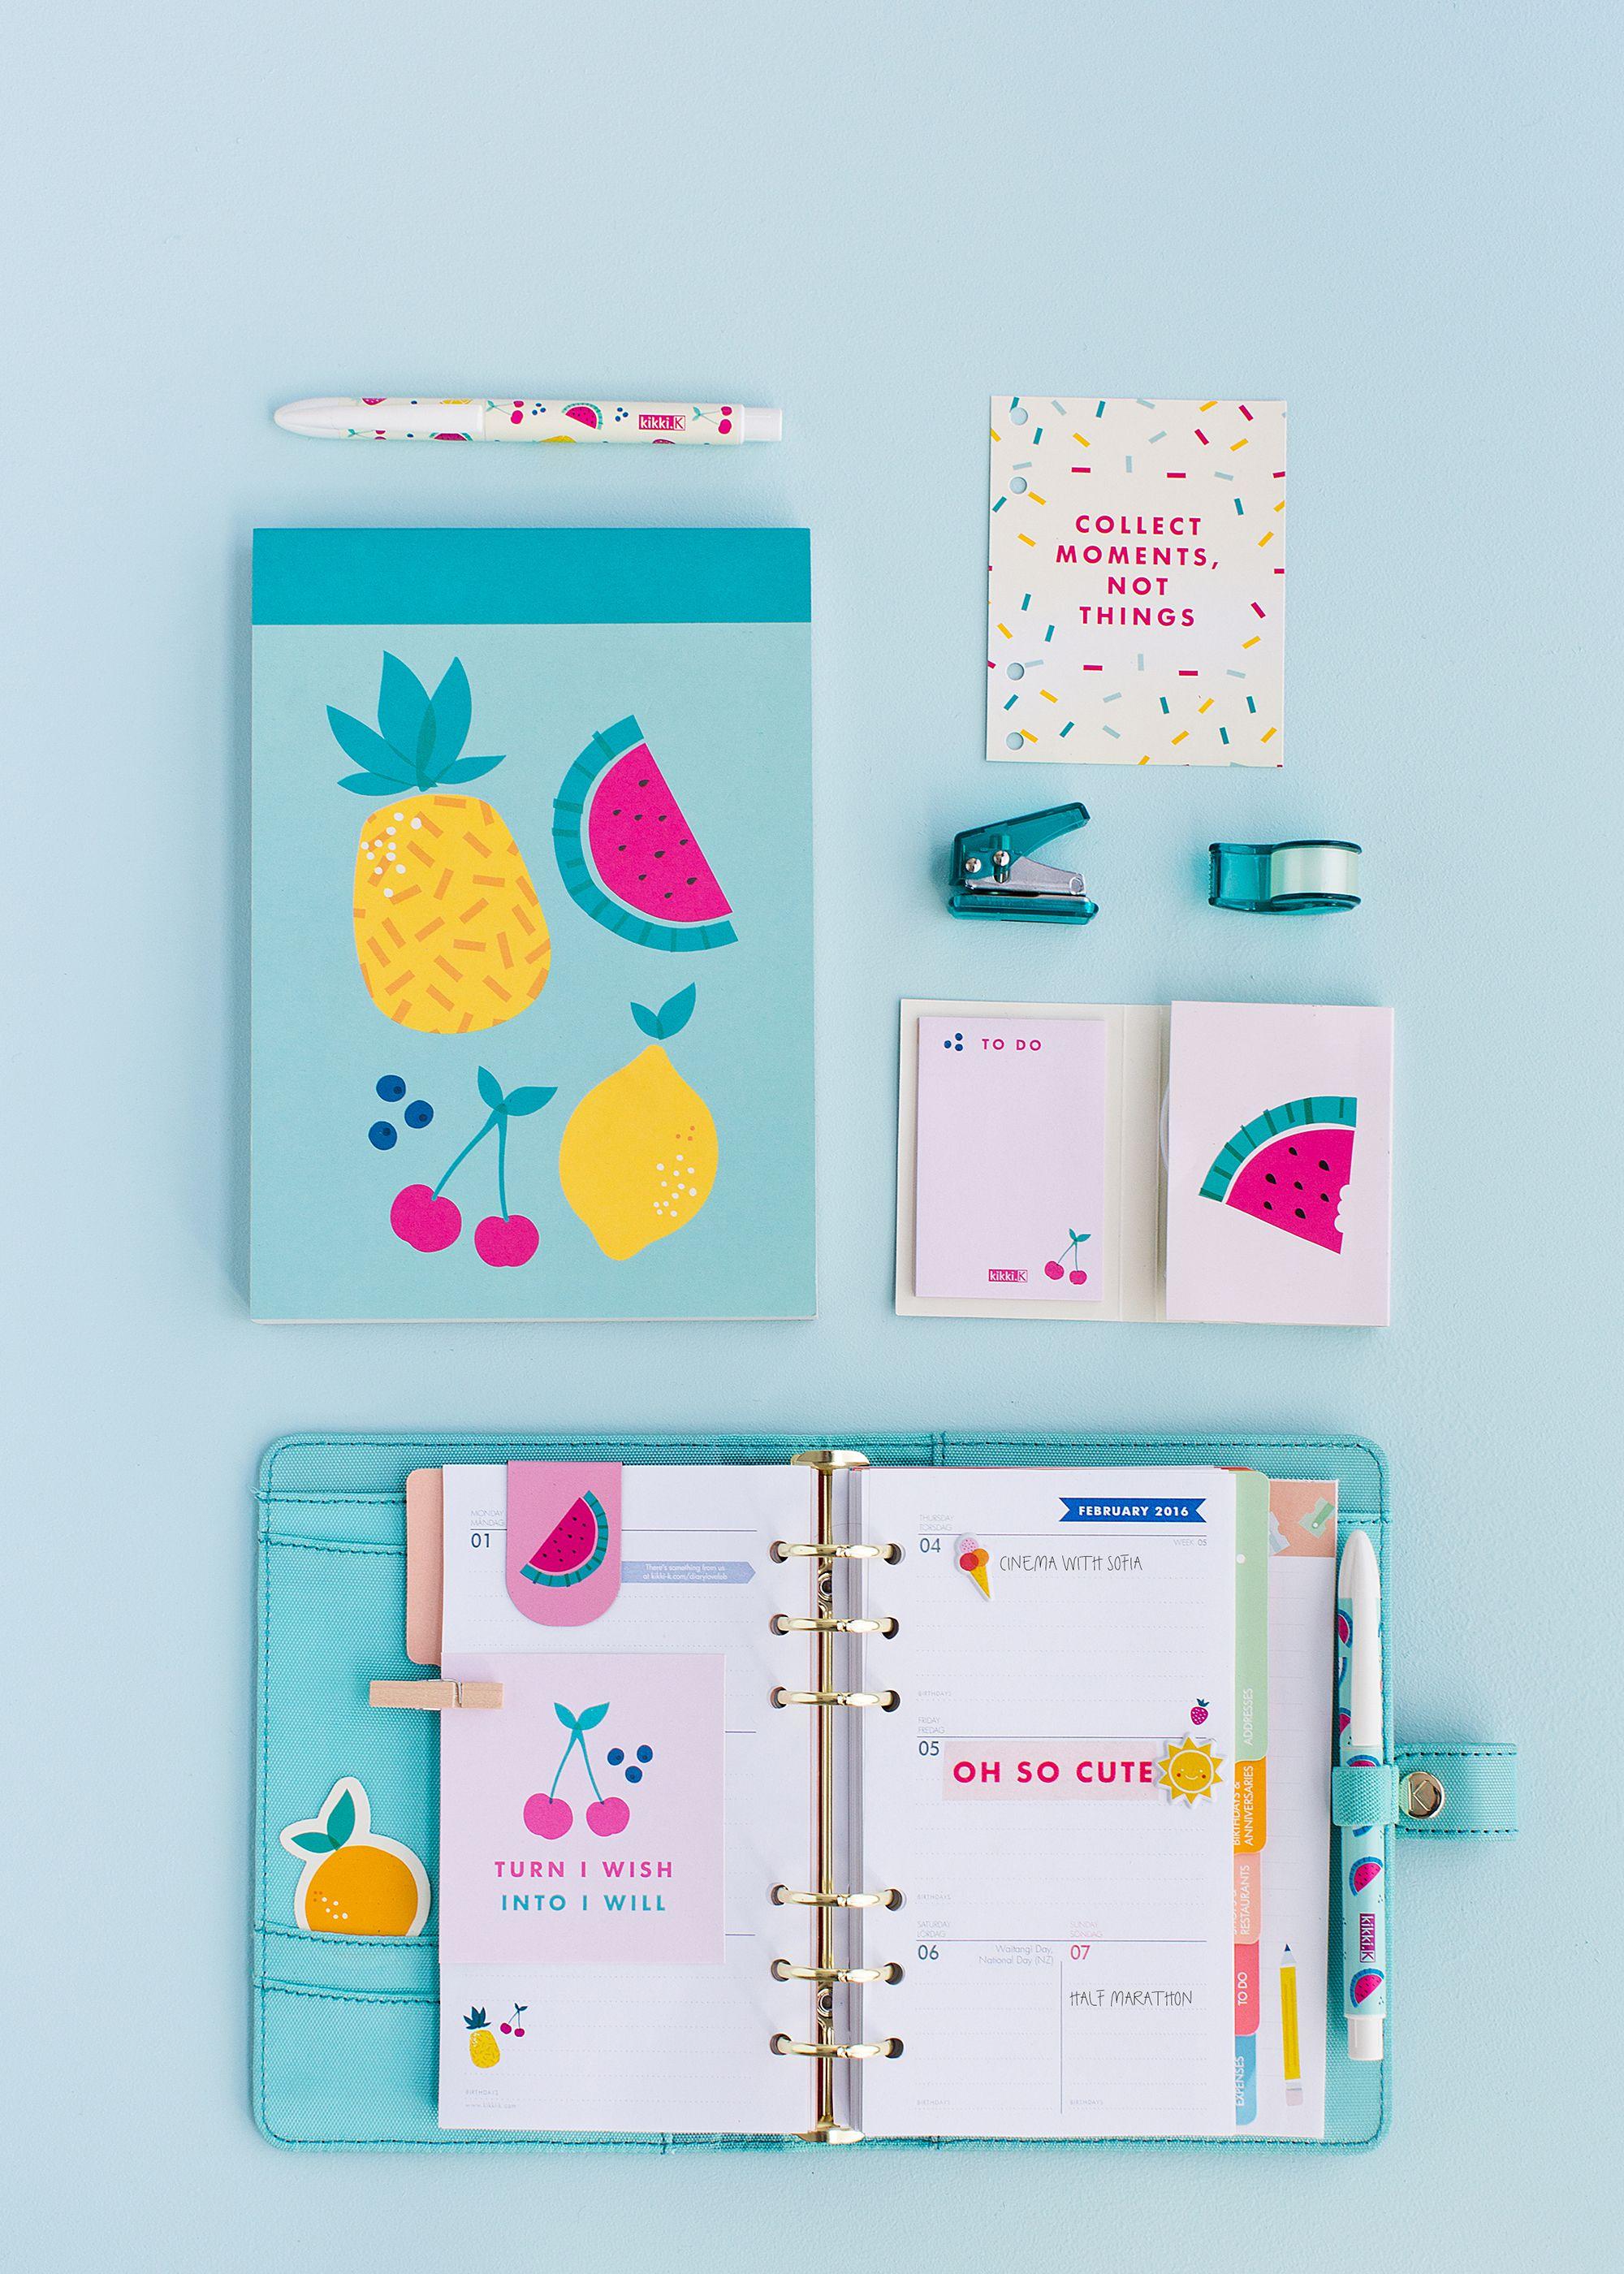 Office & School Supplies New Fashion 1 Pcs Kawaii Cartoon Dreasm Rainbow Unicorn Stickers Diy Diary Stickers For Planner Album Cute Stickers Scrapbooking Stationery Online Shop